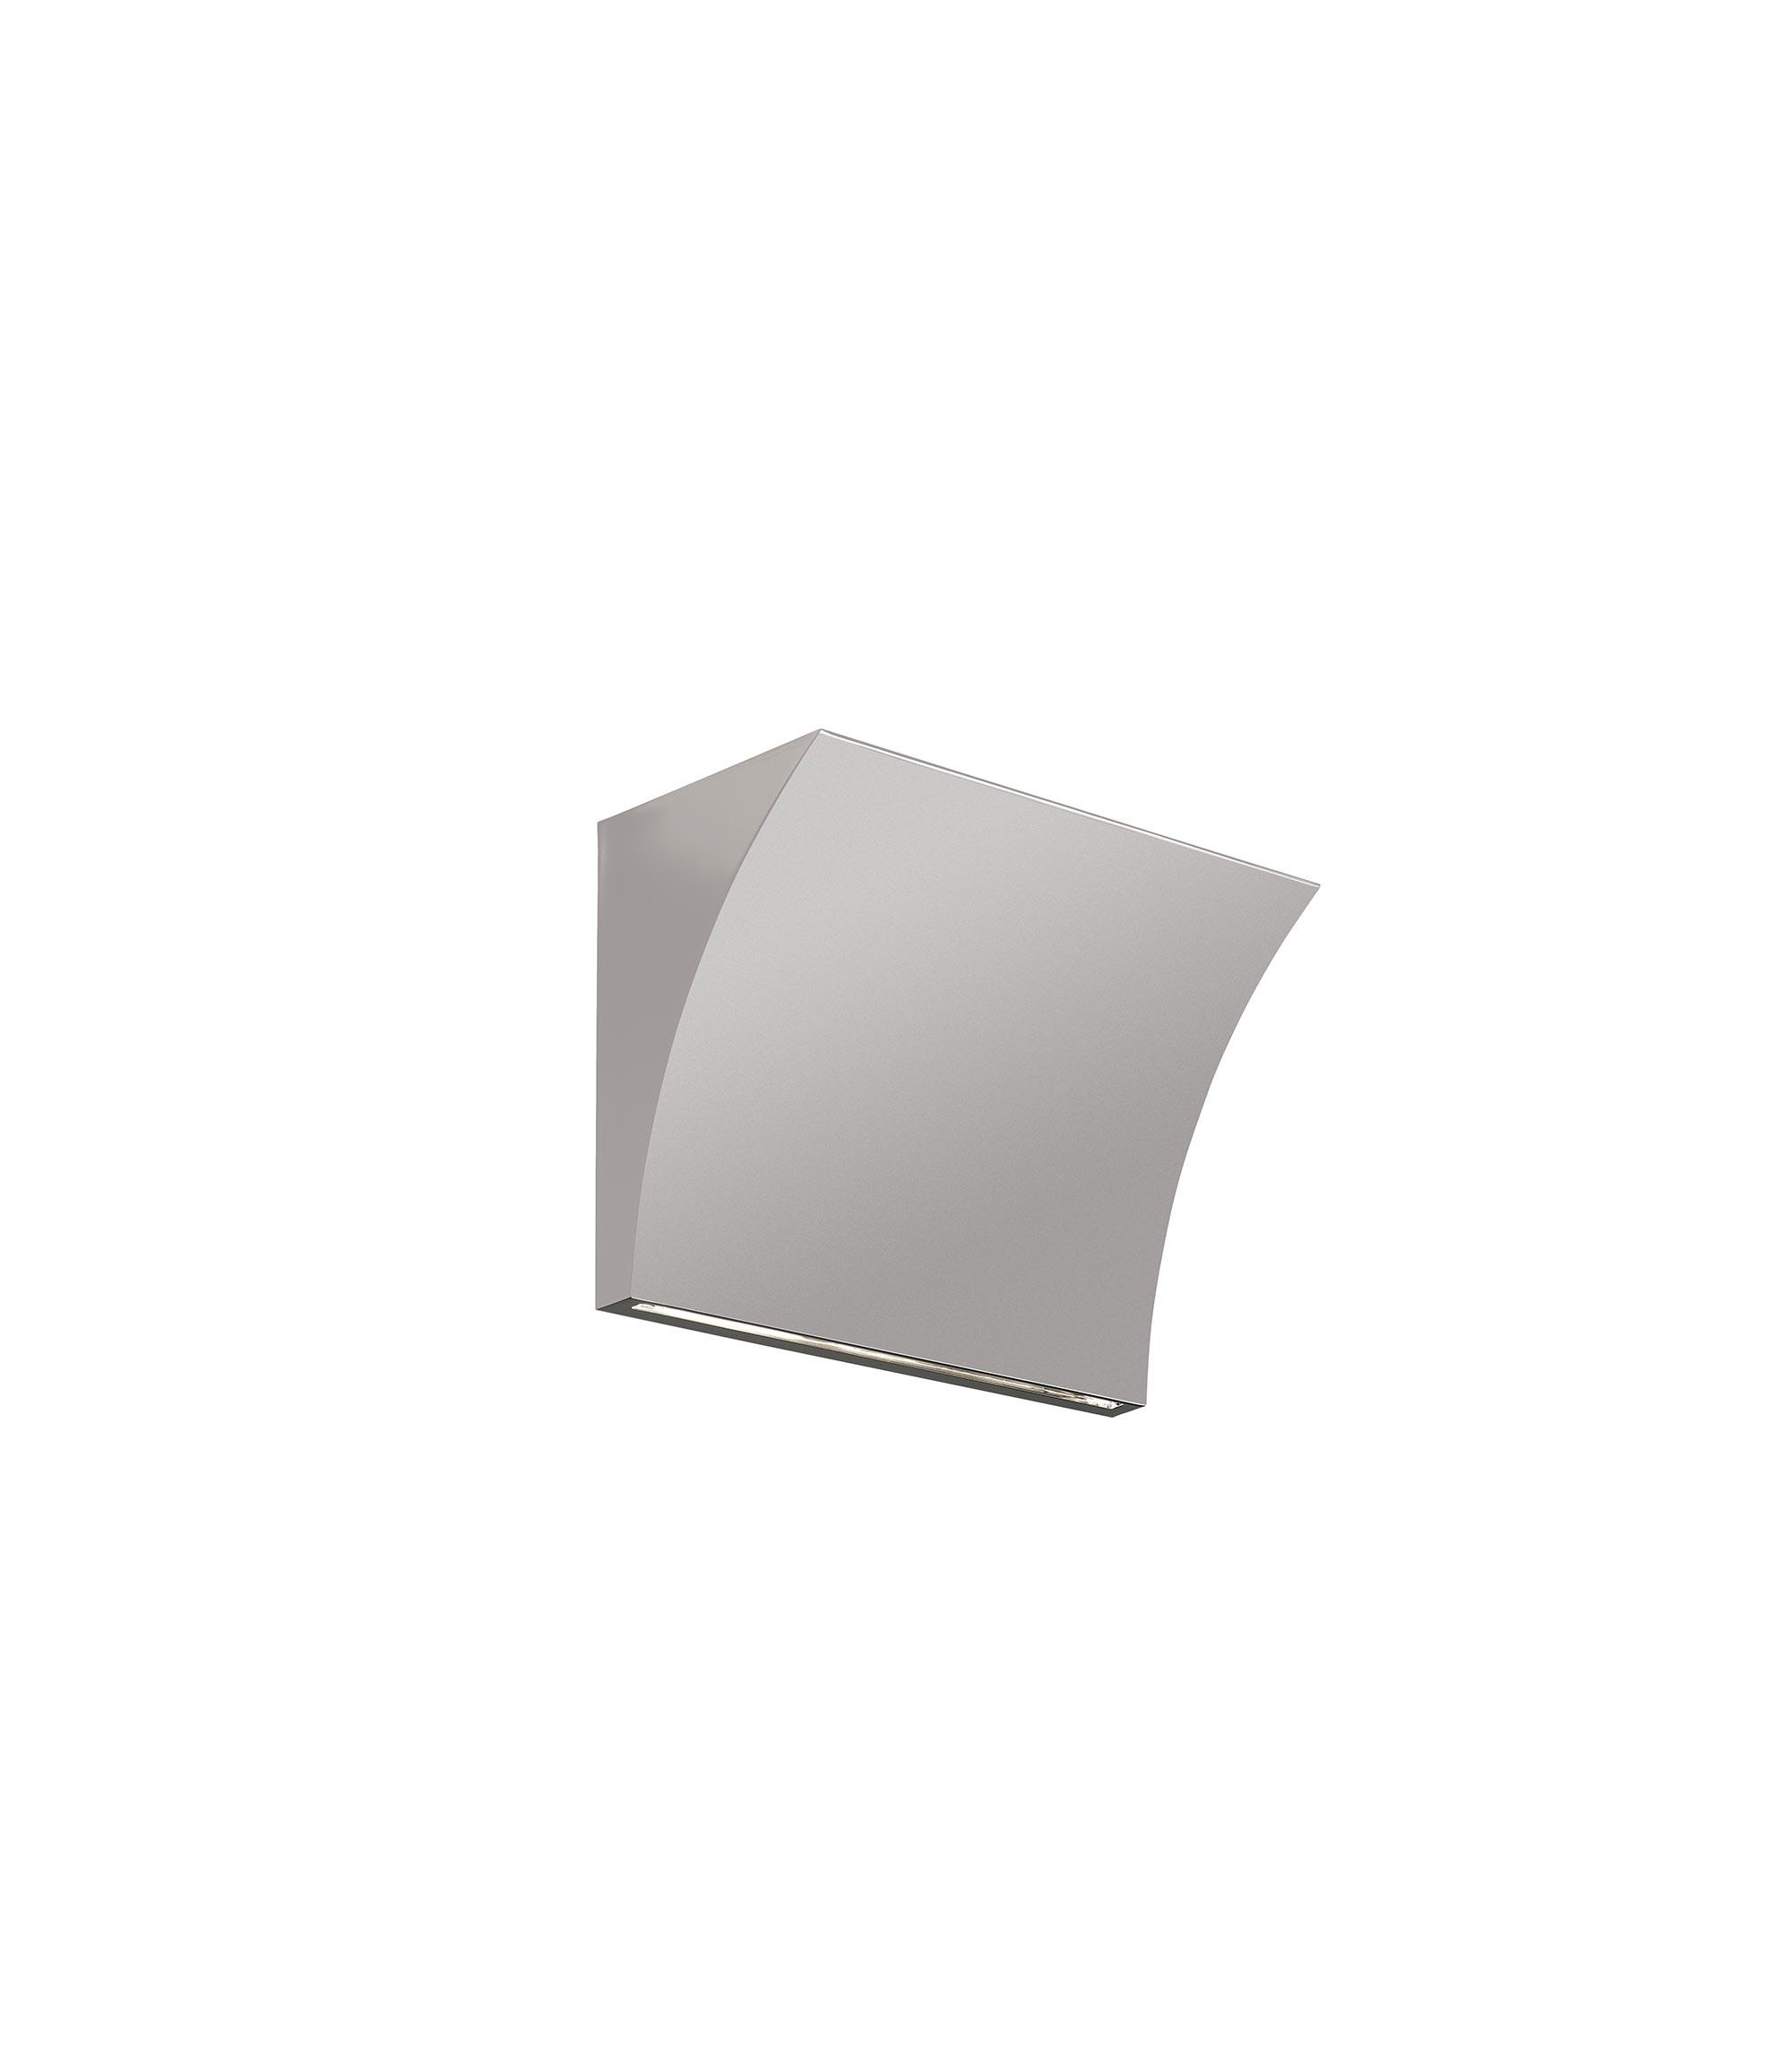 Pochette up down wall led dordoni flos F9705020 product still life big